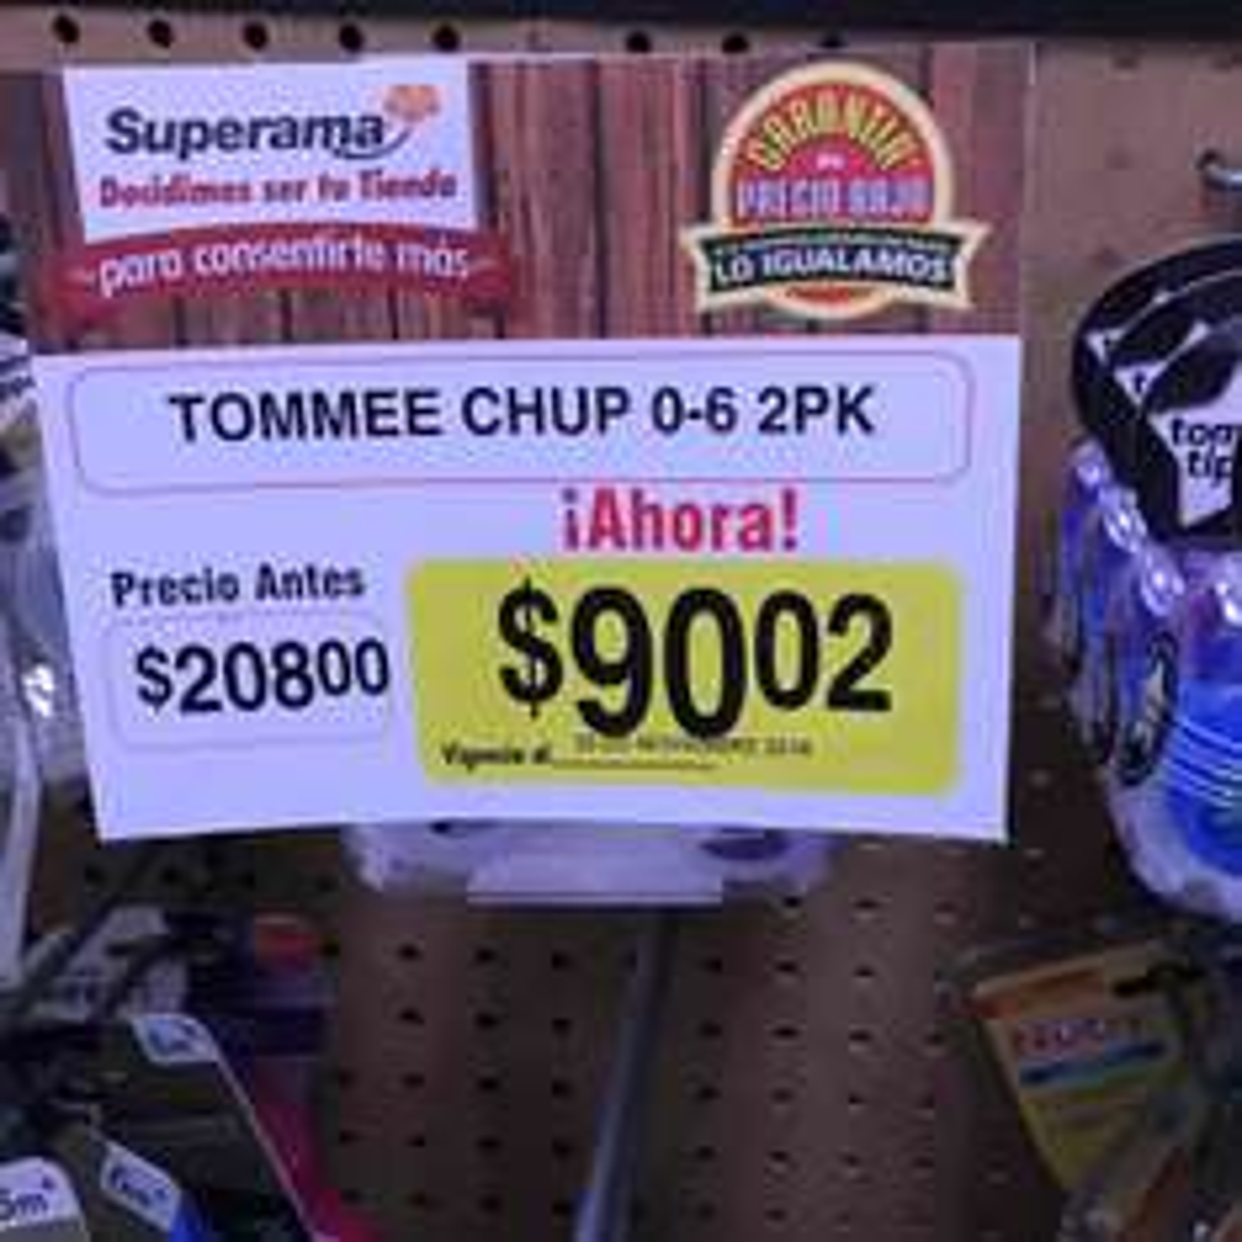 Superama: chupon a $90.02